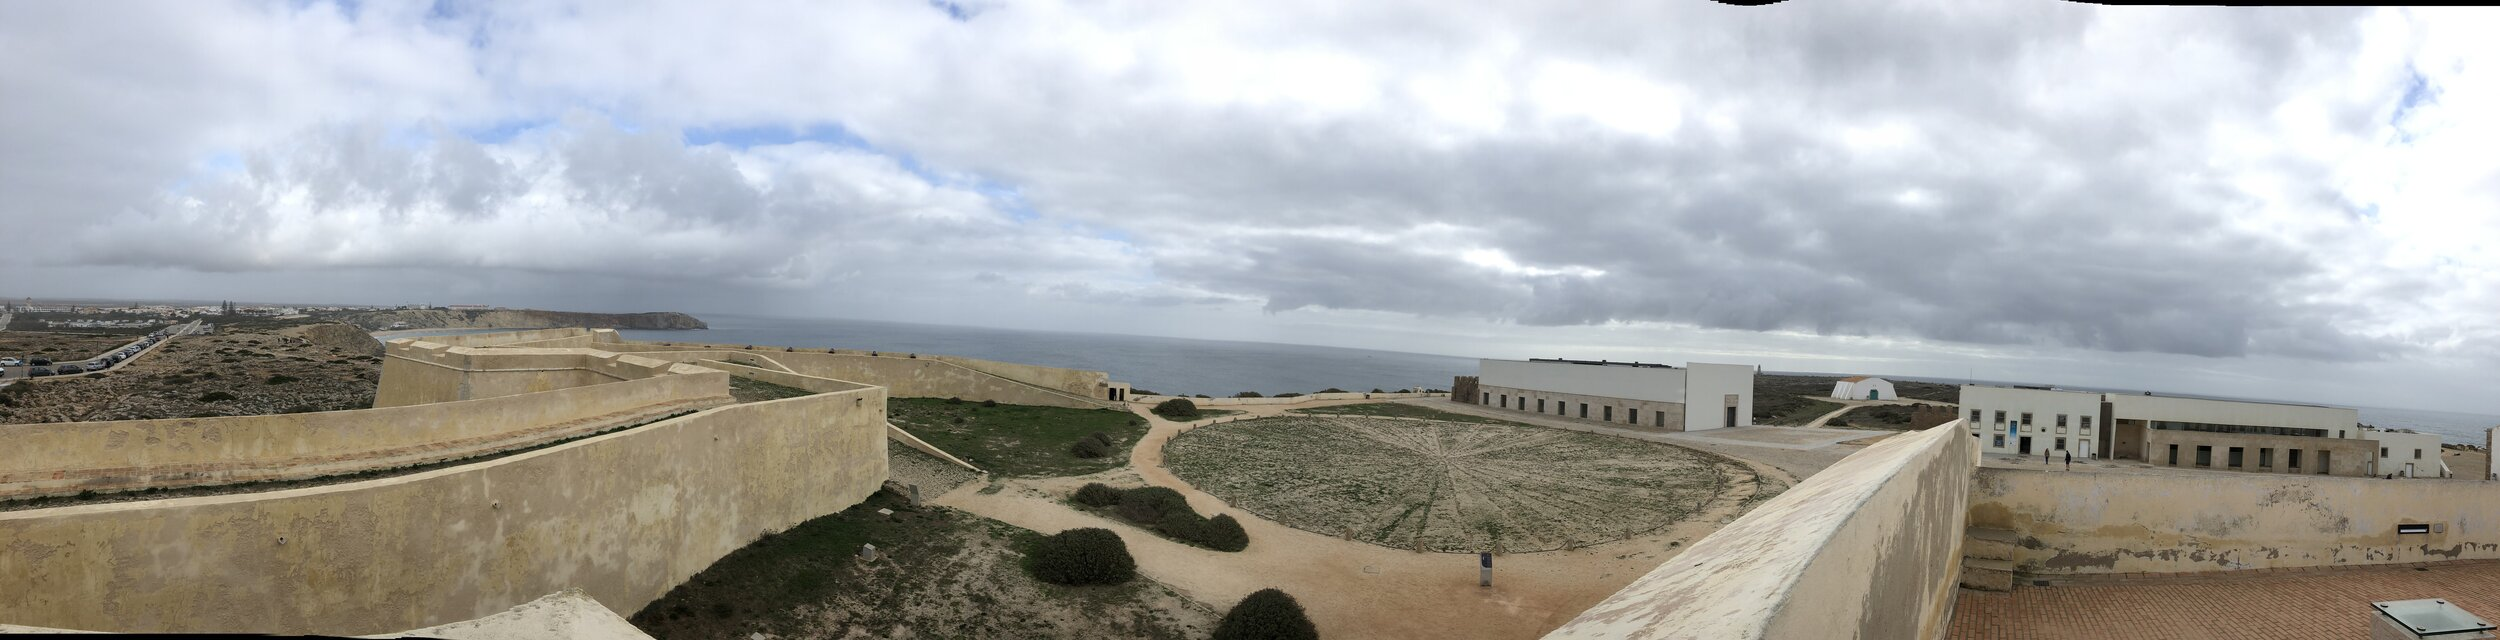 Panoramica del  fuerte de Sagre